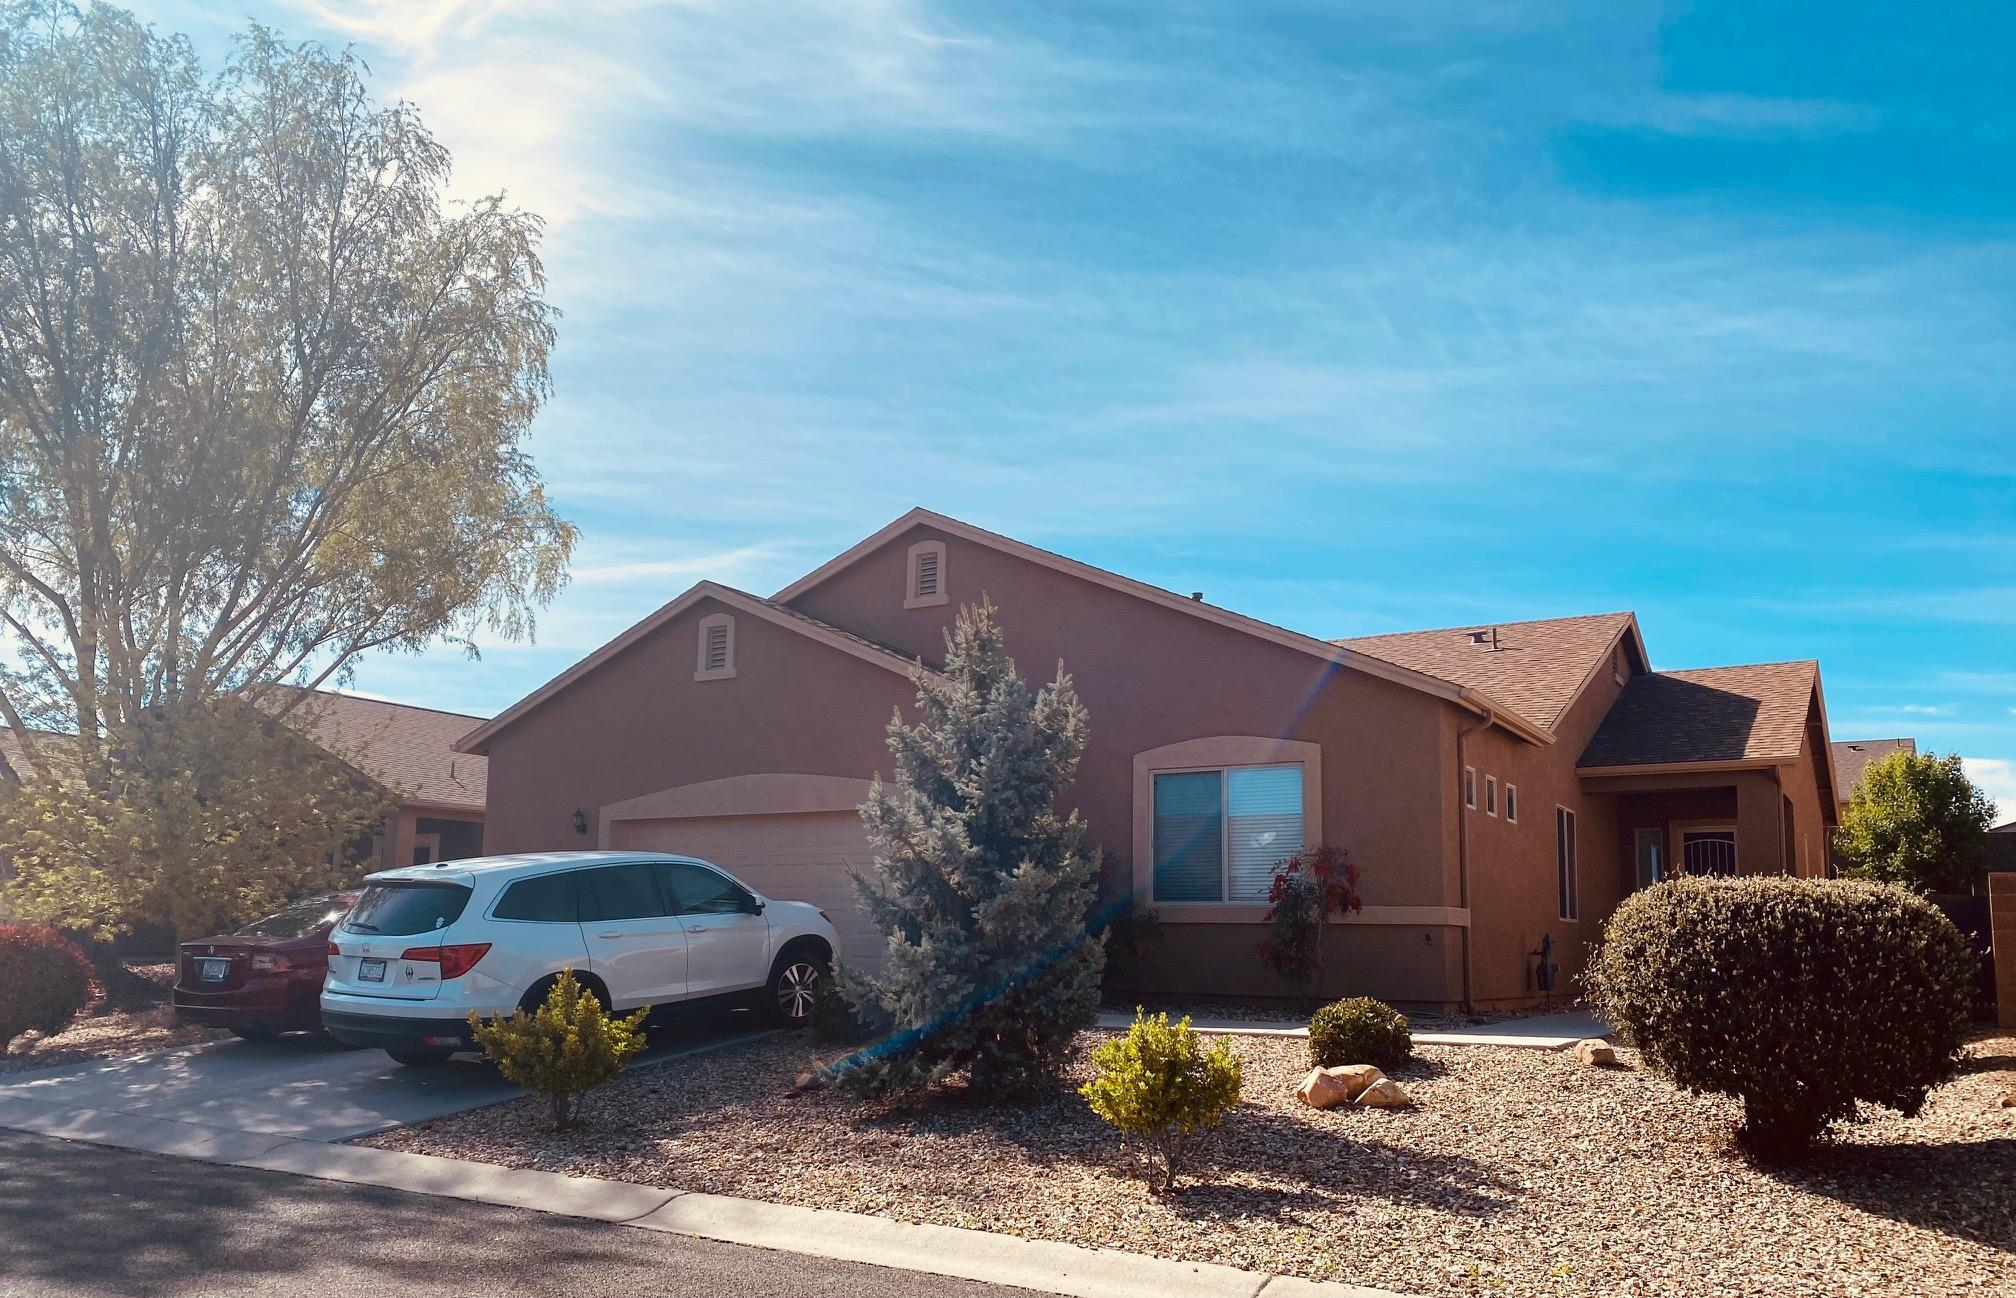 Photo of 3859 Fairfax, Prescott Valley, AZ 86314